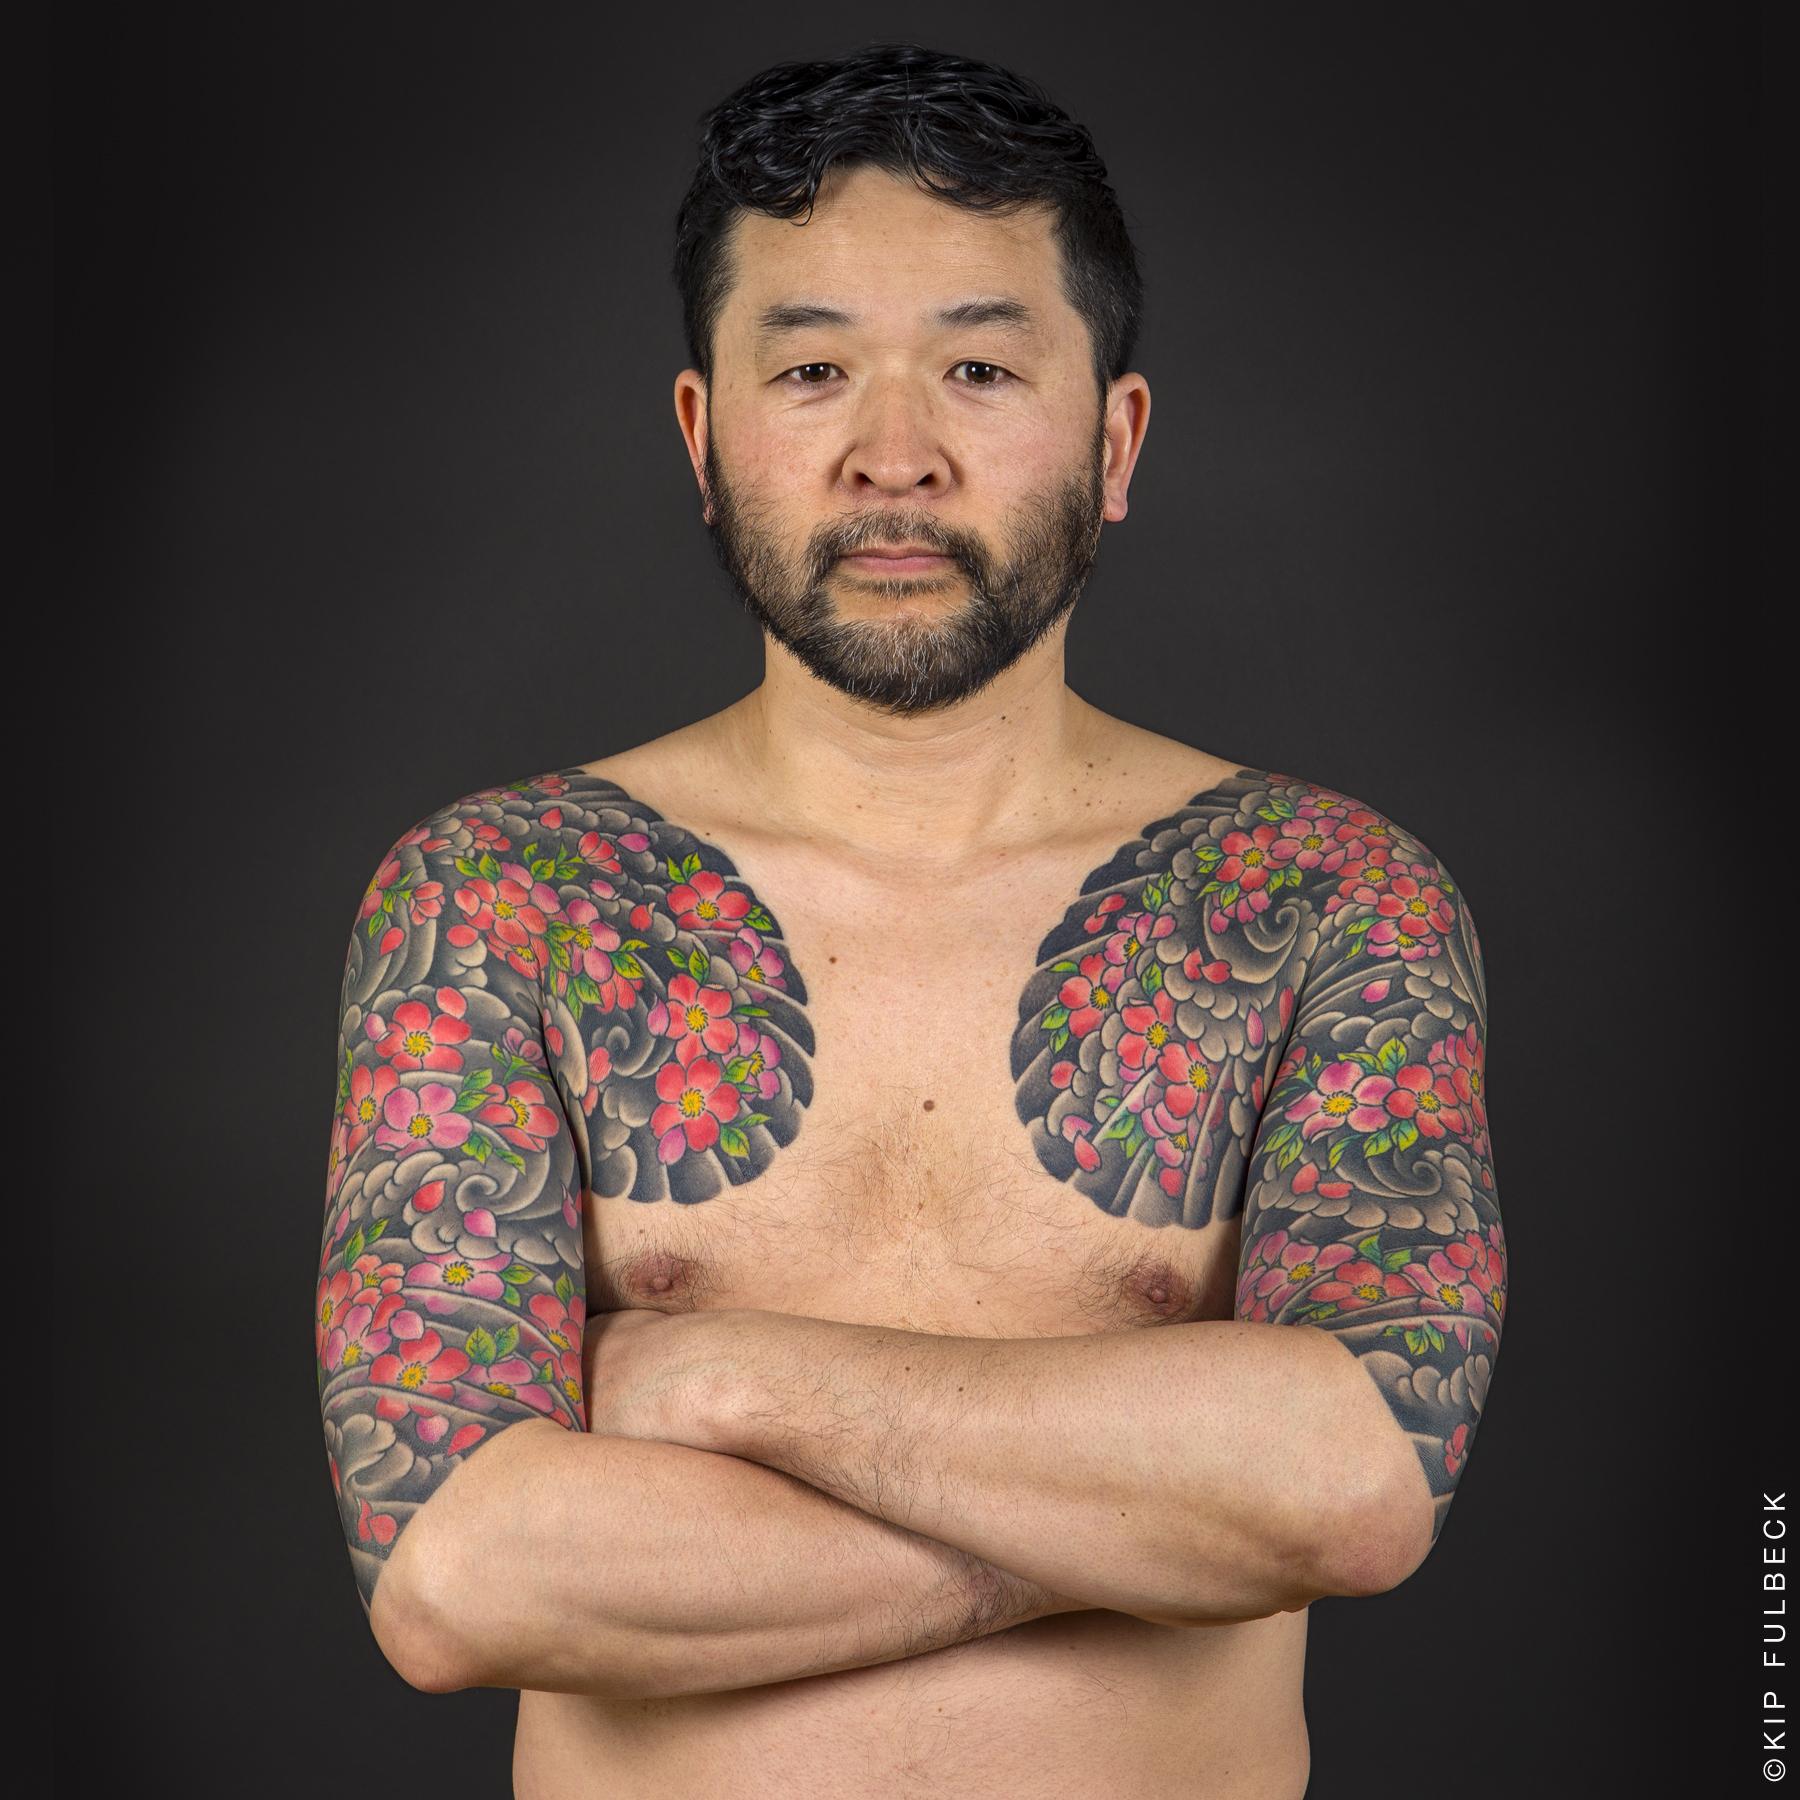 Tattoo by Yokohama Horiken. Photo by Kip Fulbeck